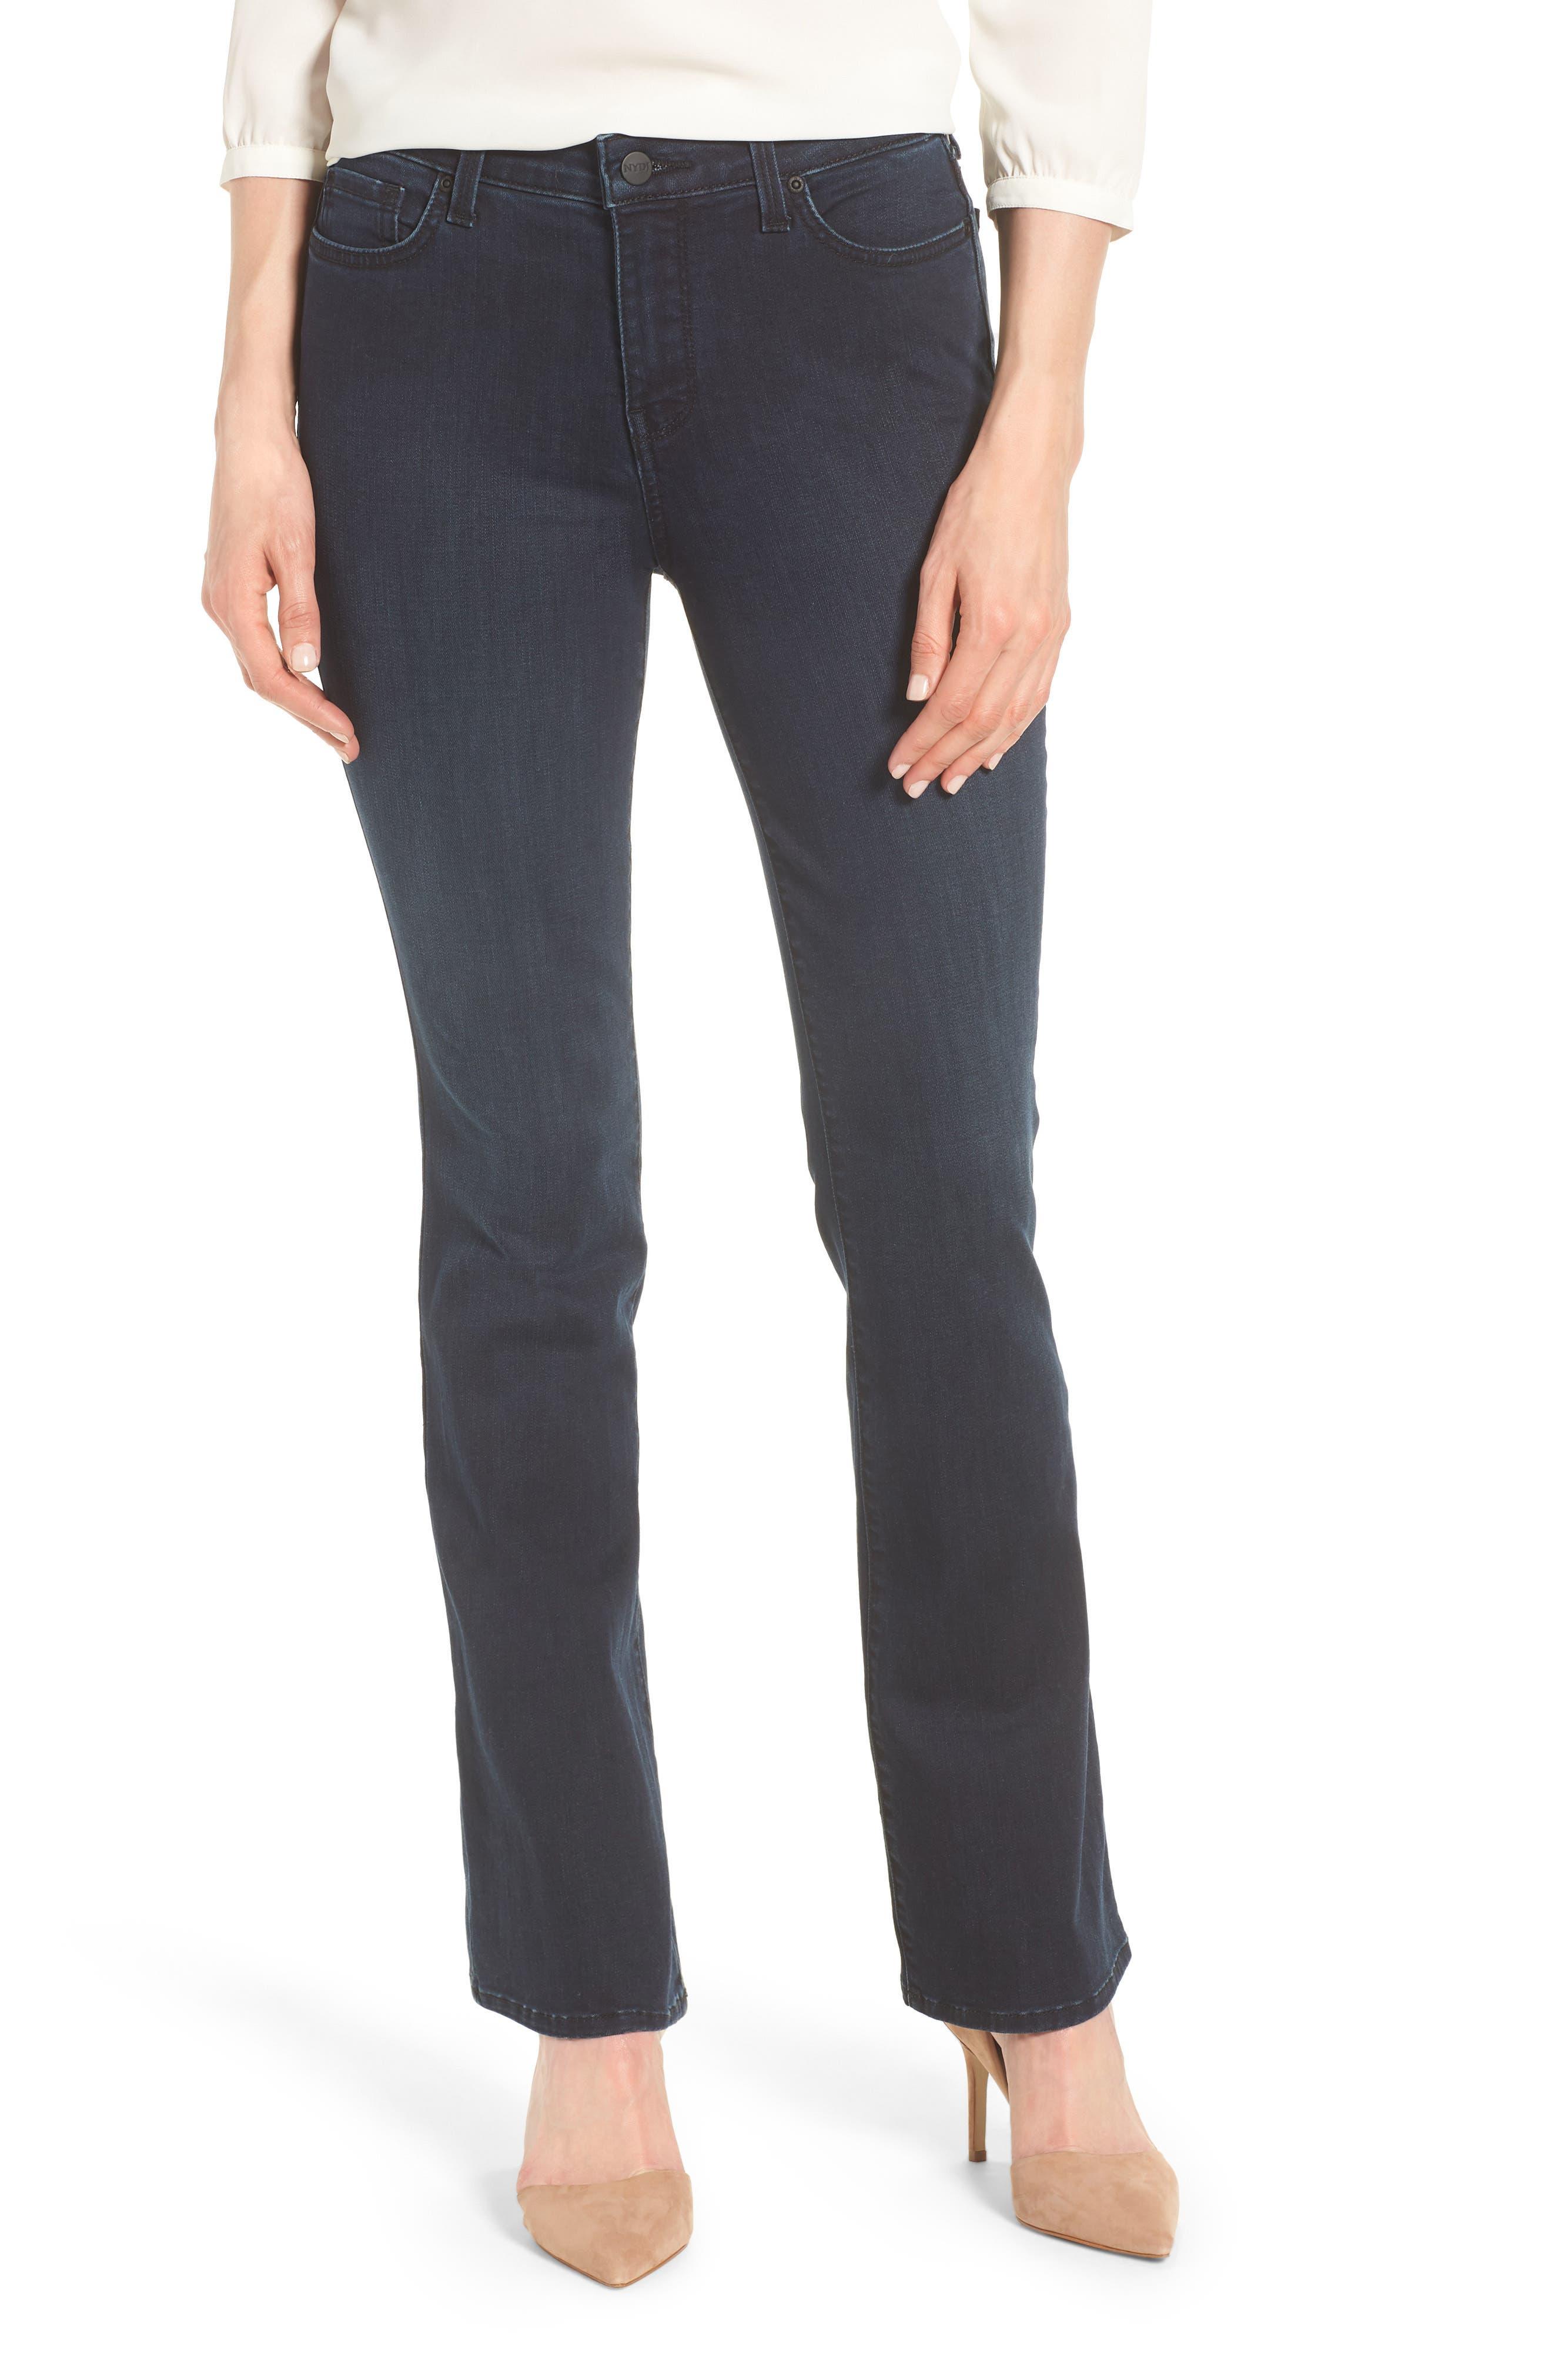 Barbara Bootcut Stretch Skinny Jeans NYDJ $59.49 (Nordstrom)